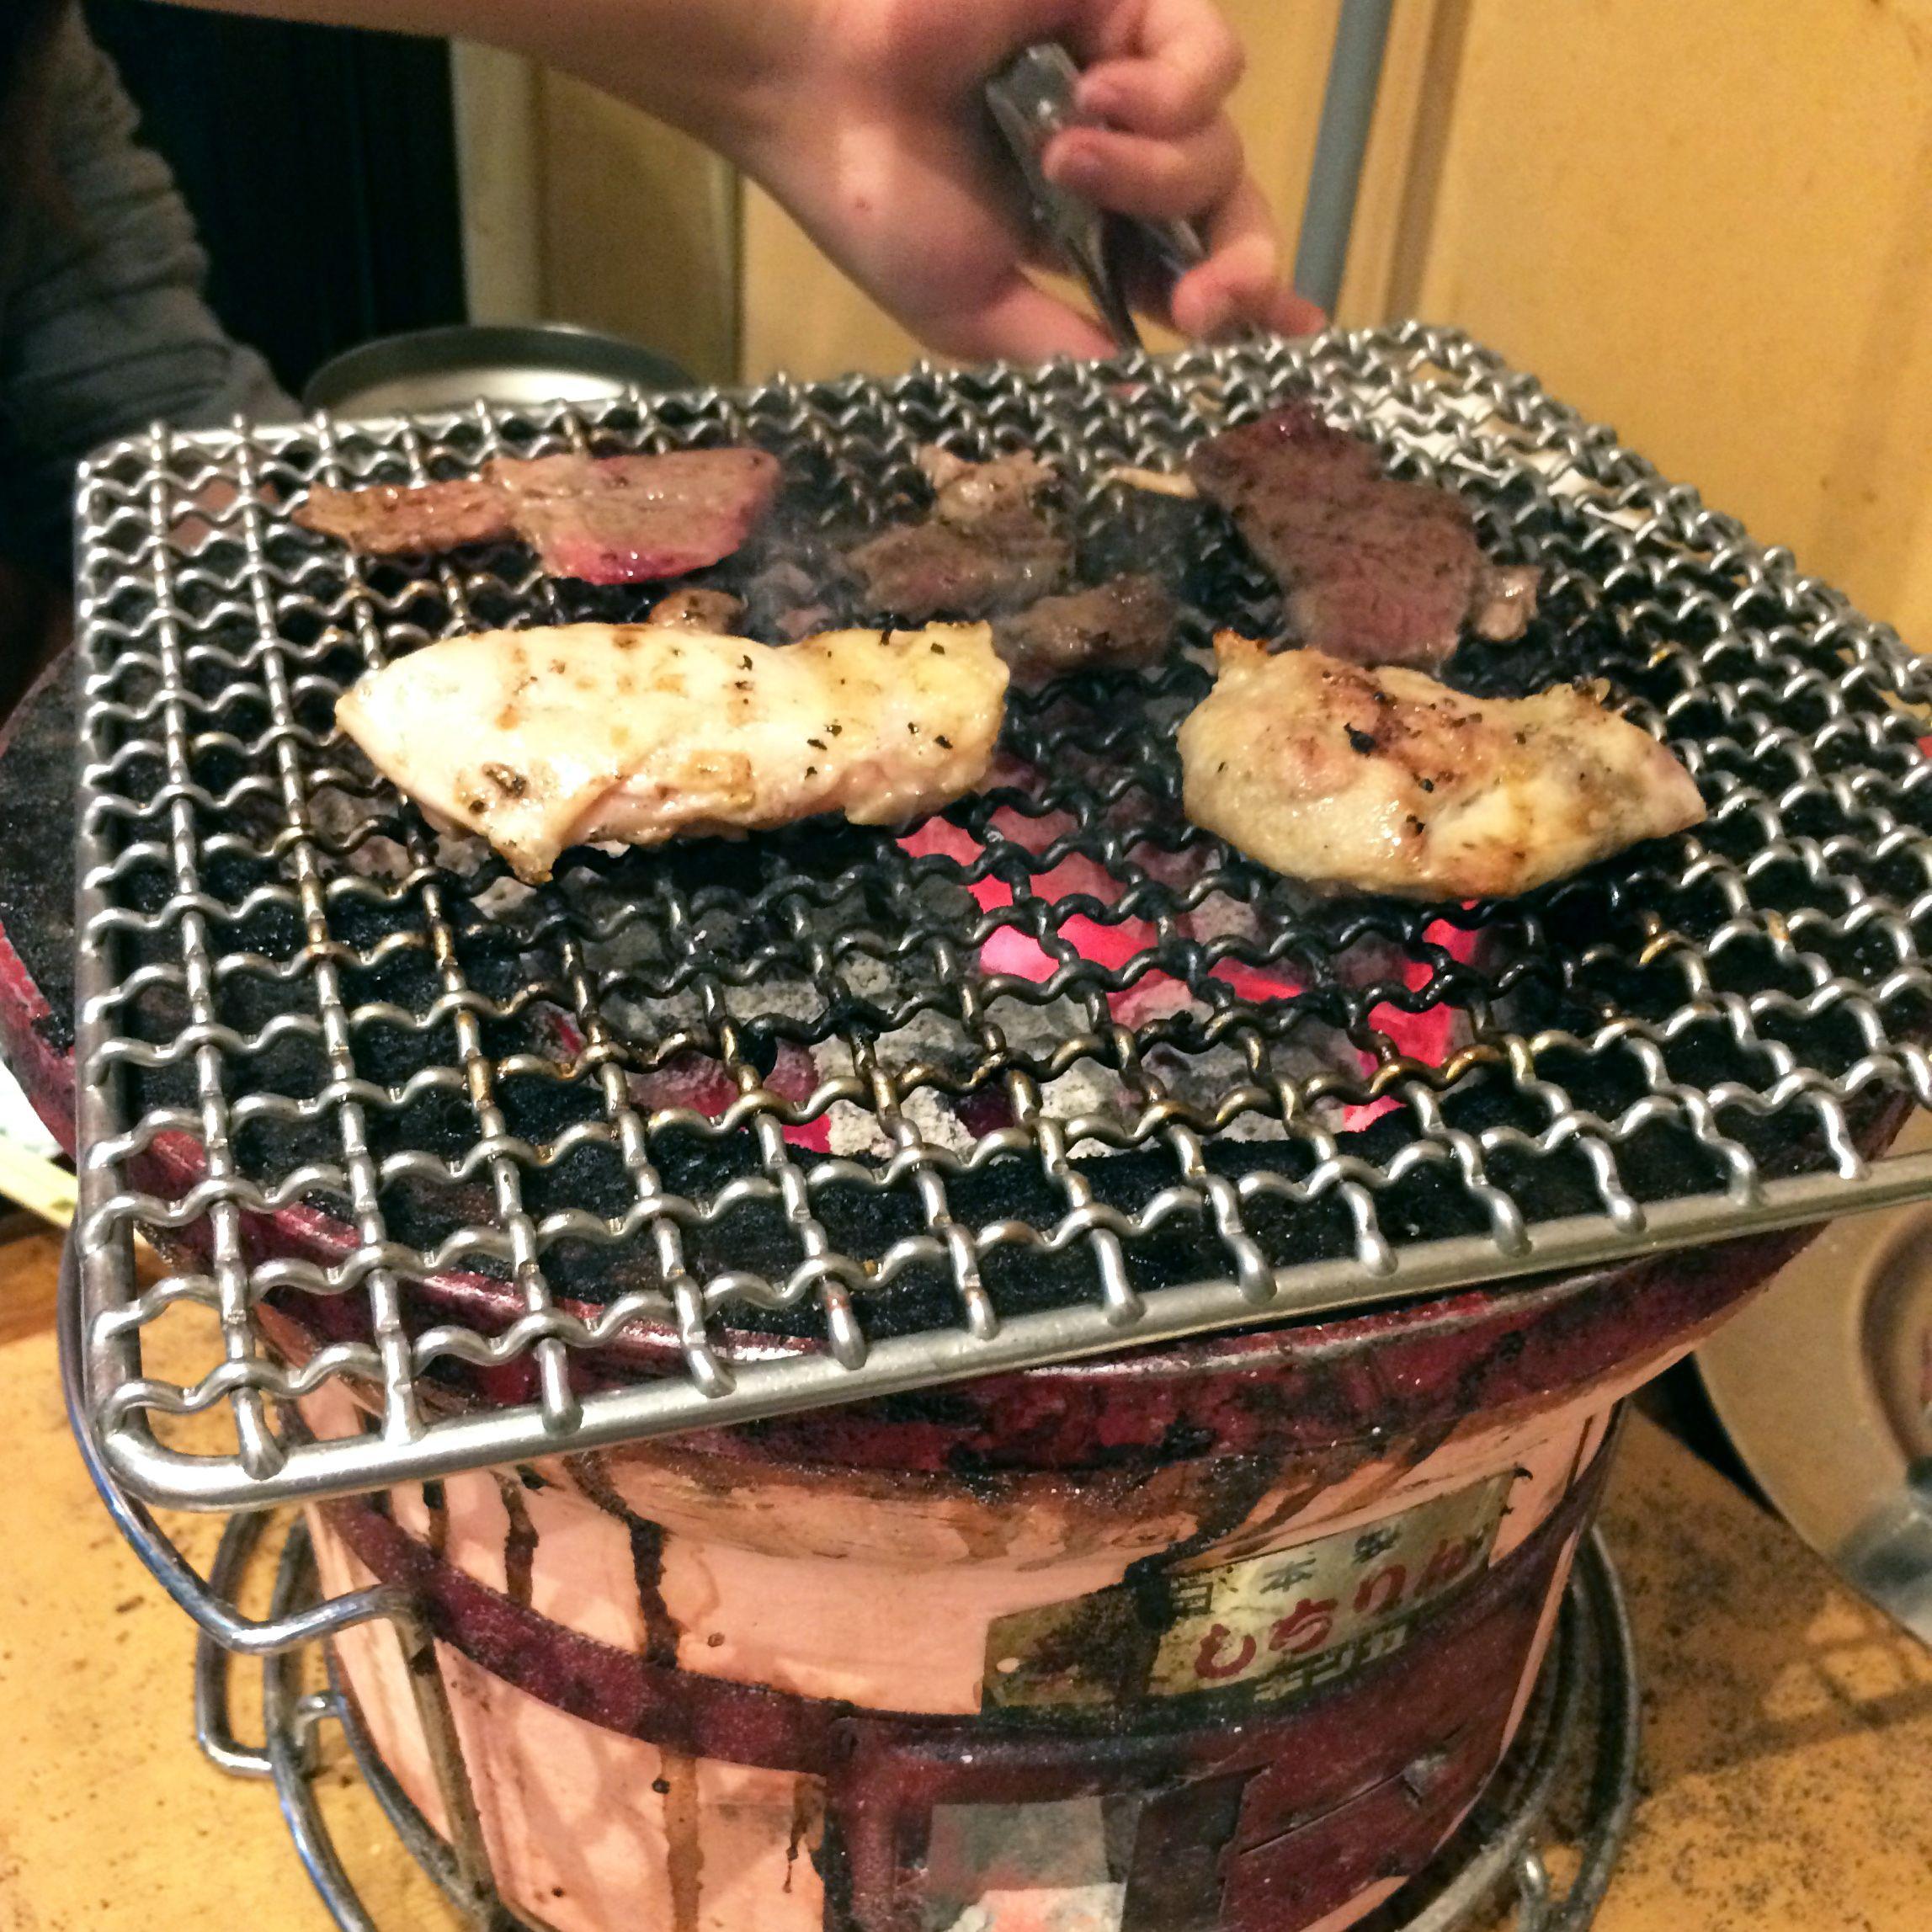 10 Reasons To Try Halal Yakiniku At Gyumon Tokyo Have Halal Will Travel Halal Food Blog For Muslim Travellers Halal Recipes Food Food Blog